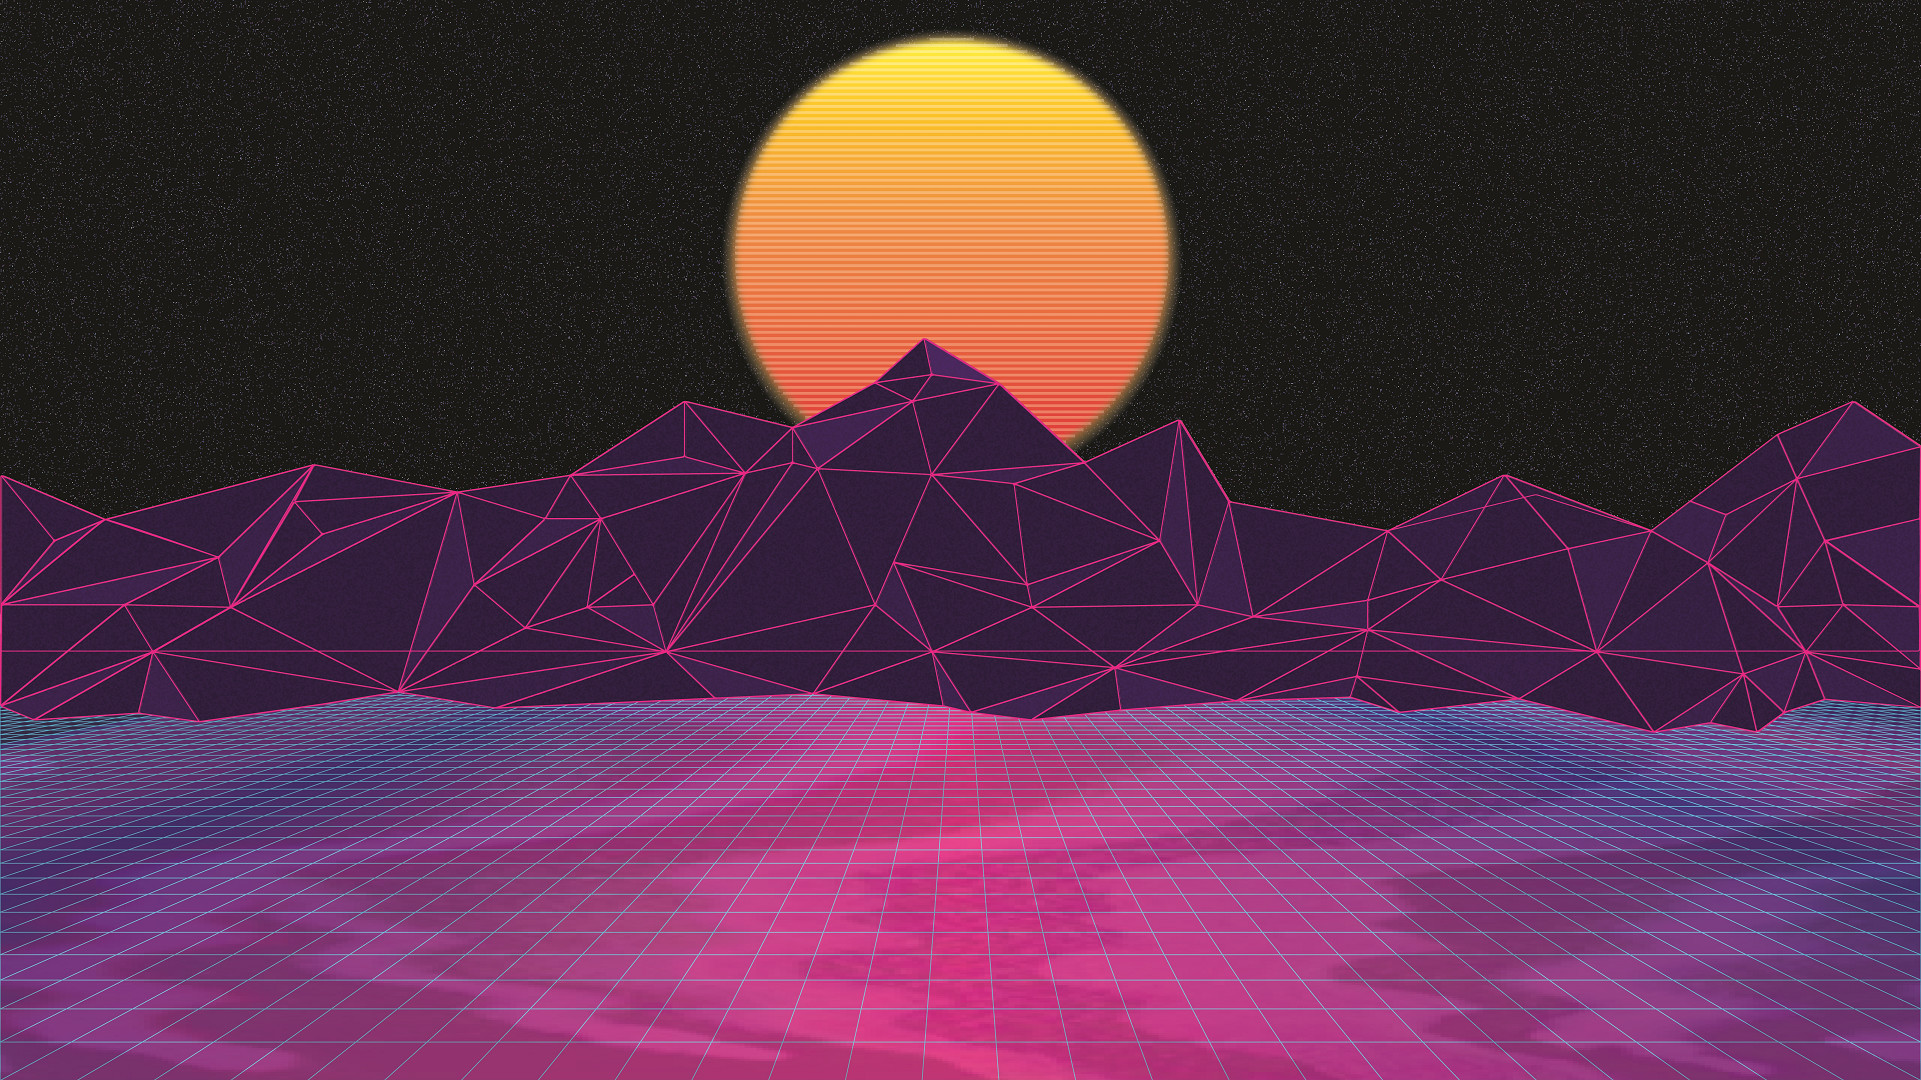 Futuristic Vaporwave Wallpapers Vaporwave Aesthetic 25057 Hd Wallpaper Backgrounds Download